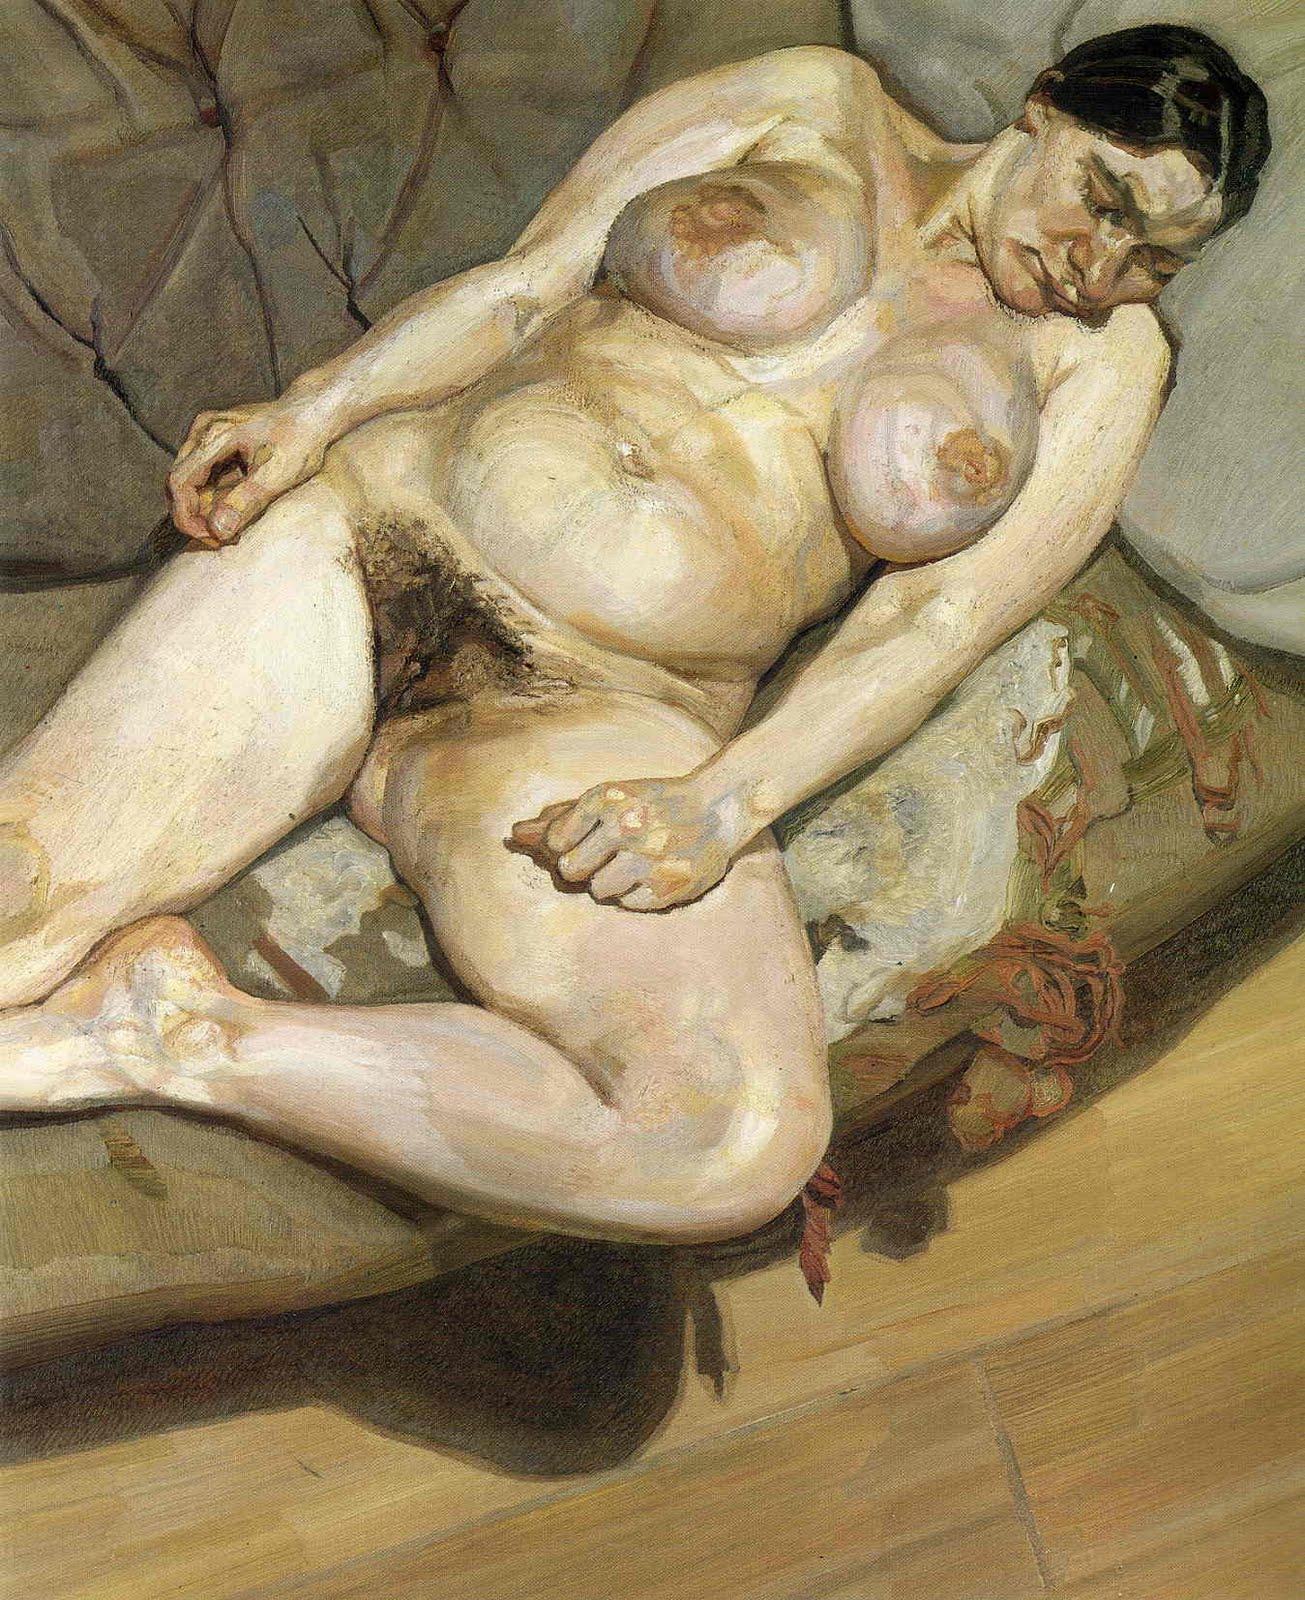 Lucian freud naked portrait remarkable, rather